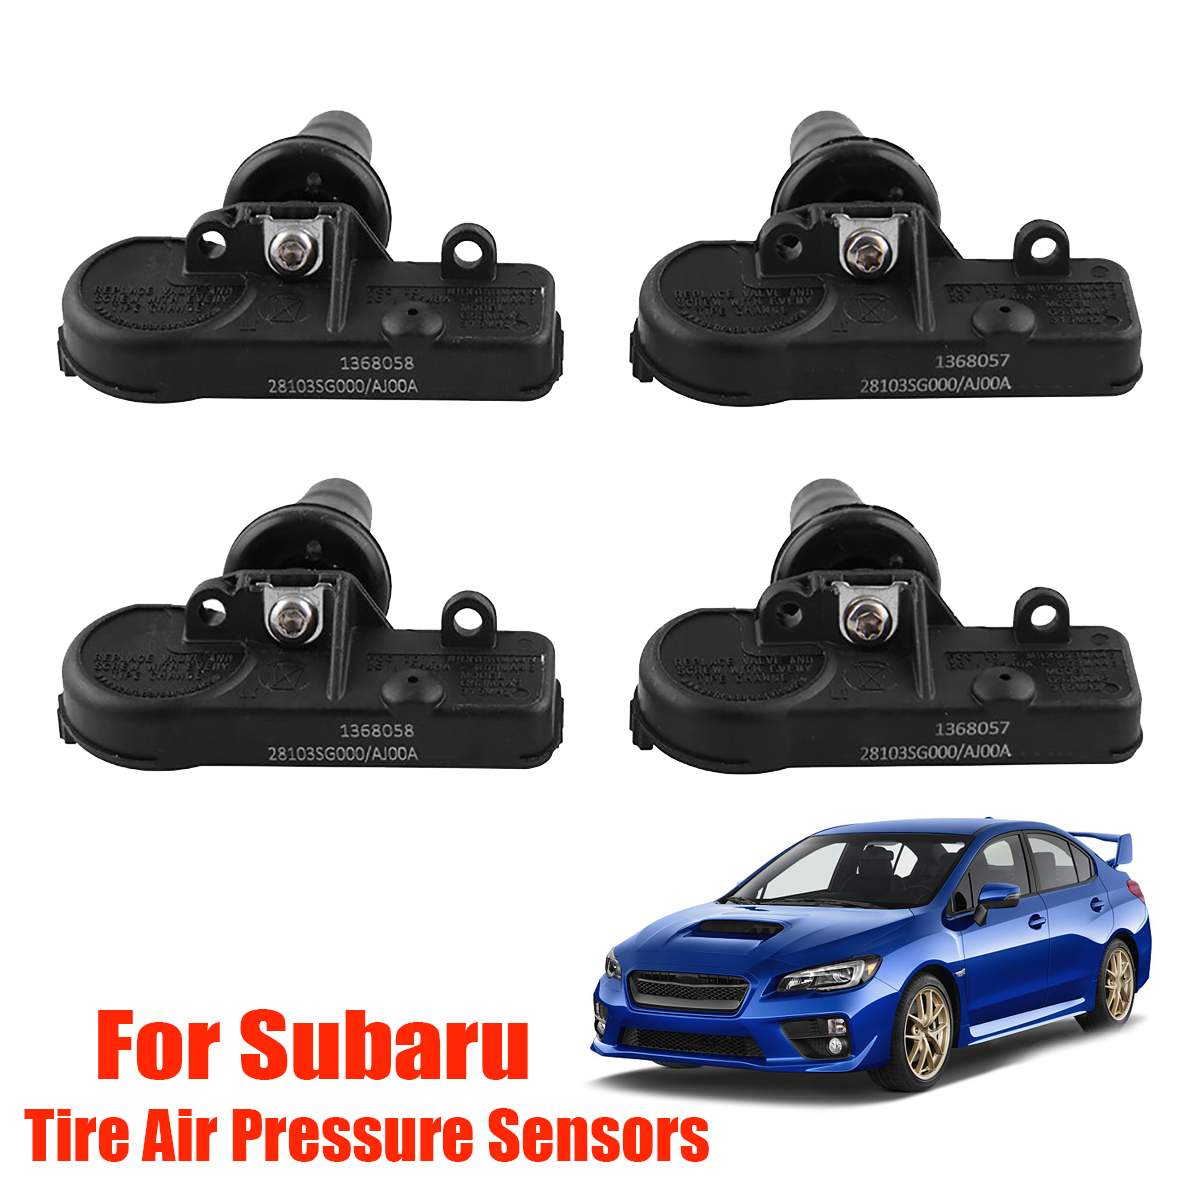 4Pcs/Set Tire Pressure Sensors Genuine TPMS Tire Air Pressure Sensors For Subaru 28103SG000 28103AJ00A Internal External Tyre